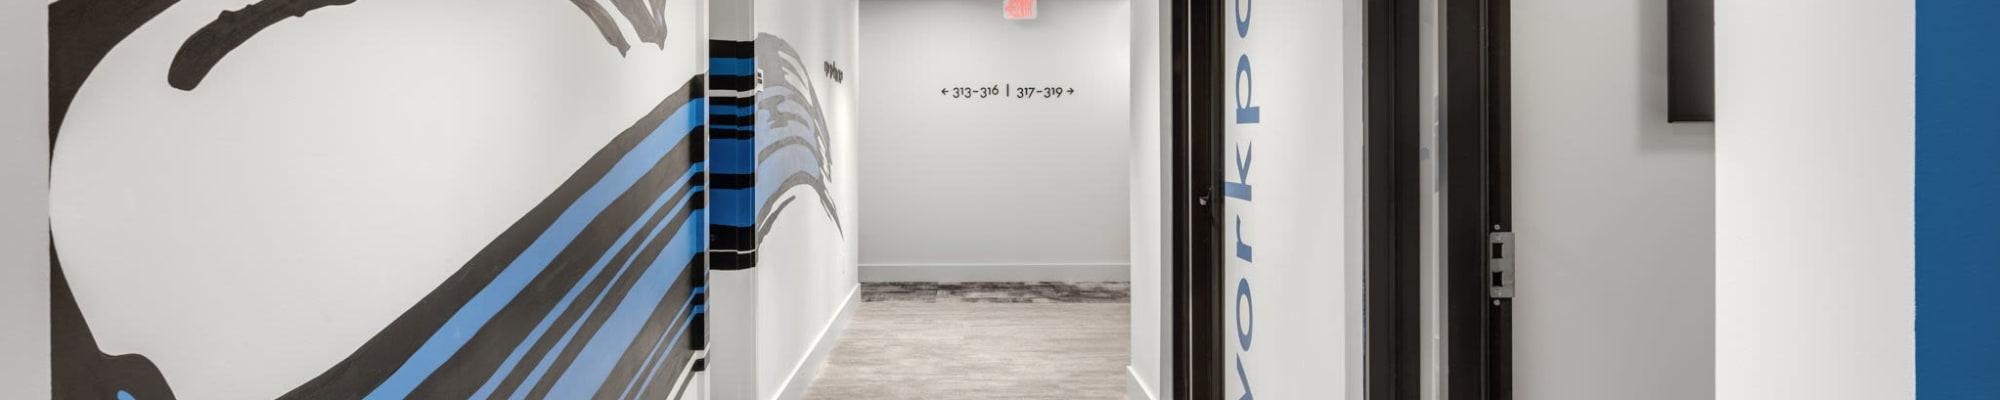 Virtual tours at Arthaus Apartments in Allston, Massachusetts